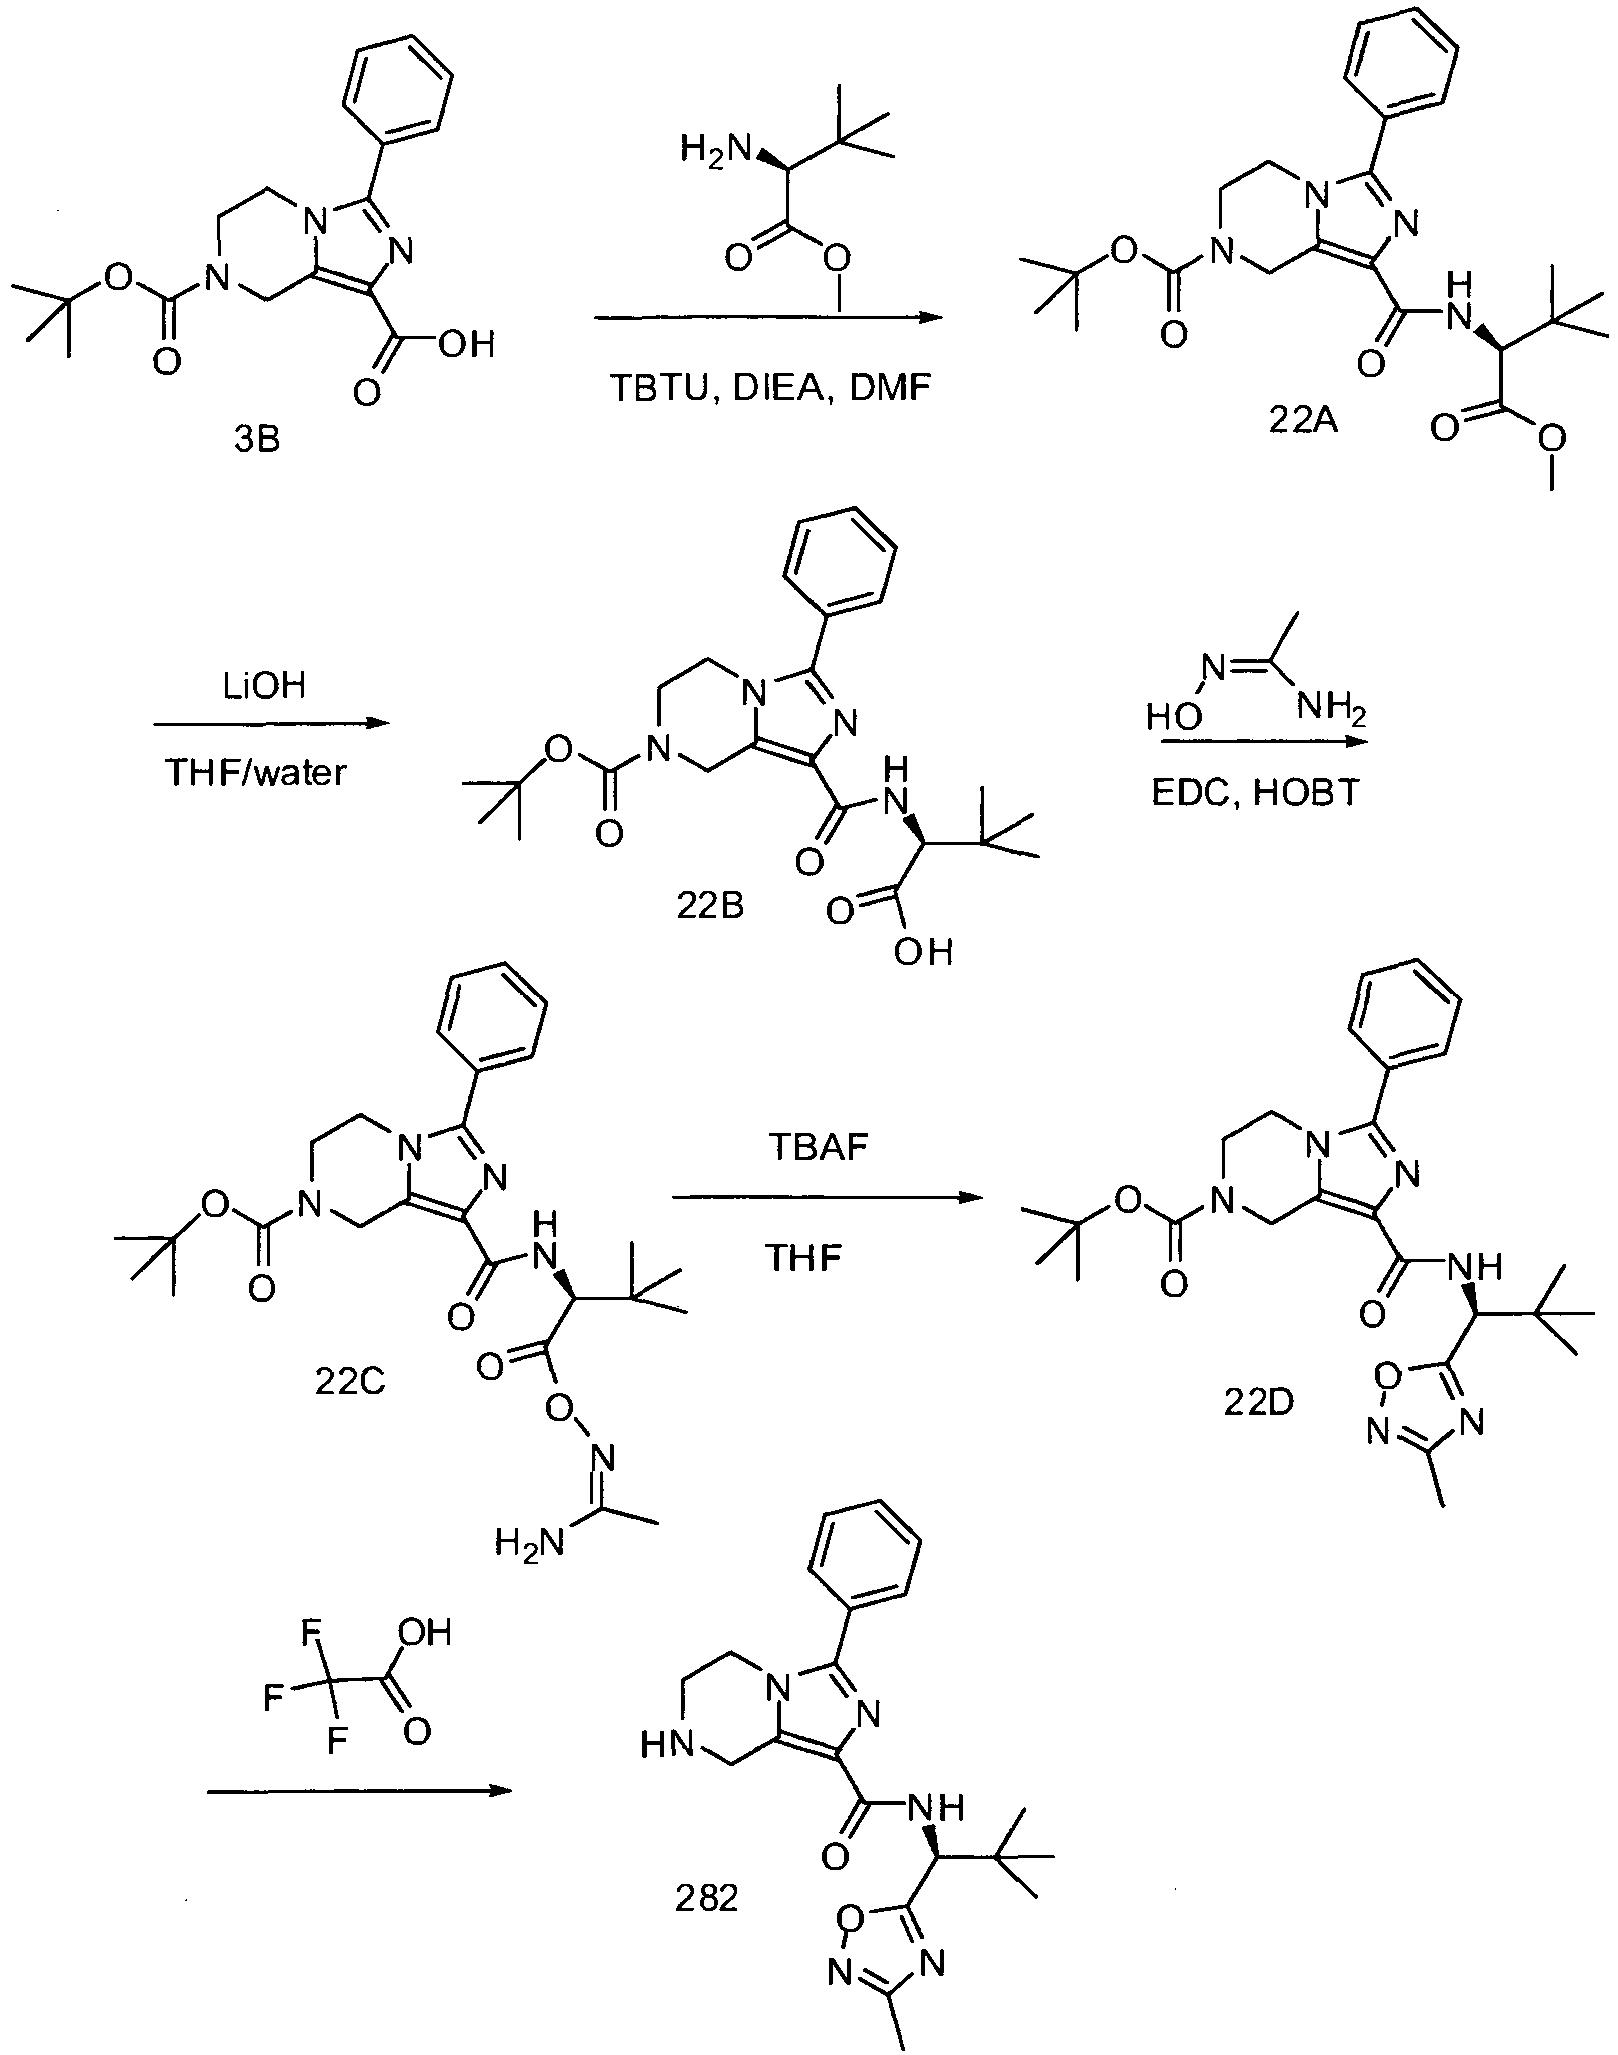 NS規制物質リストGADSL準拠  nipponseikicojp